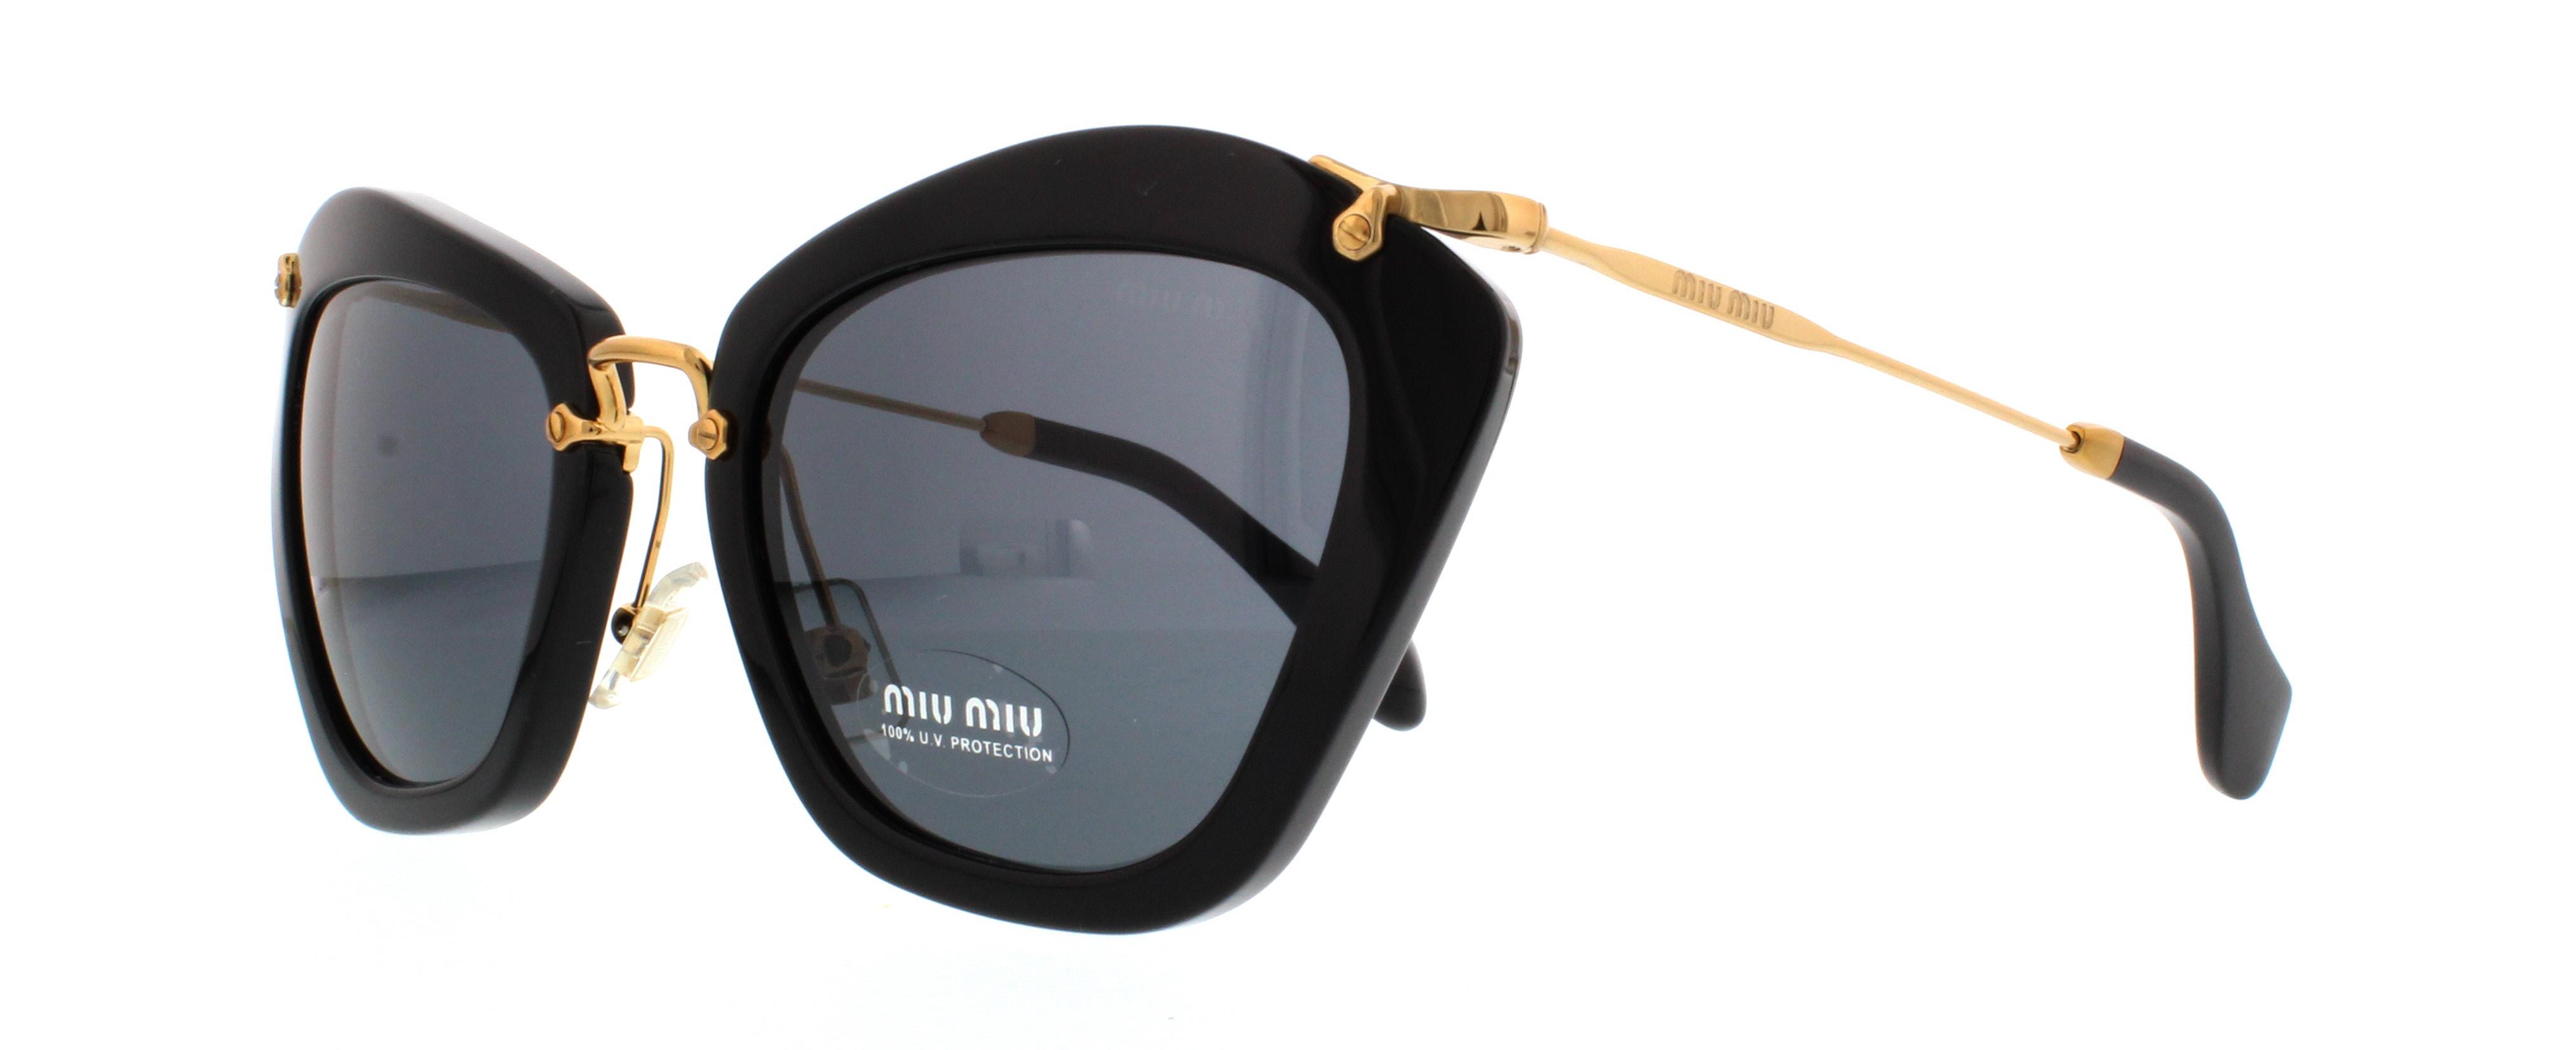 a86478868eb2 Designer Frames Outlet. Miu Miu MU10NS Noir